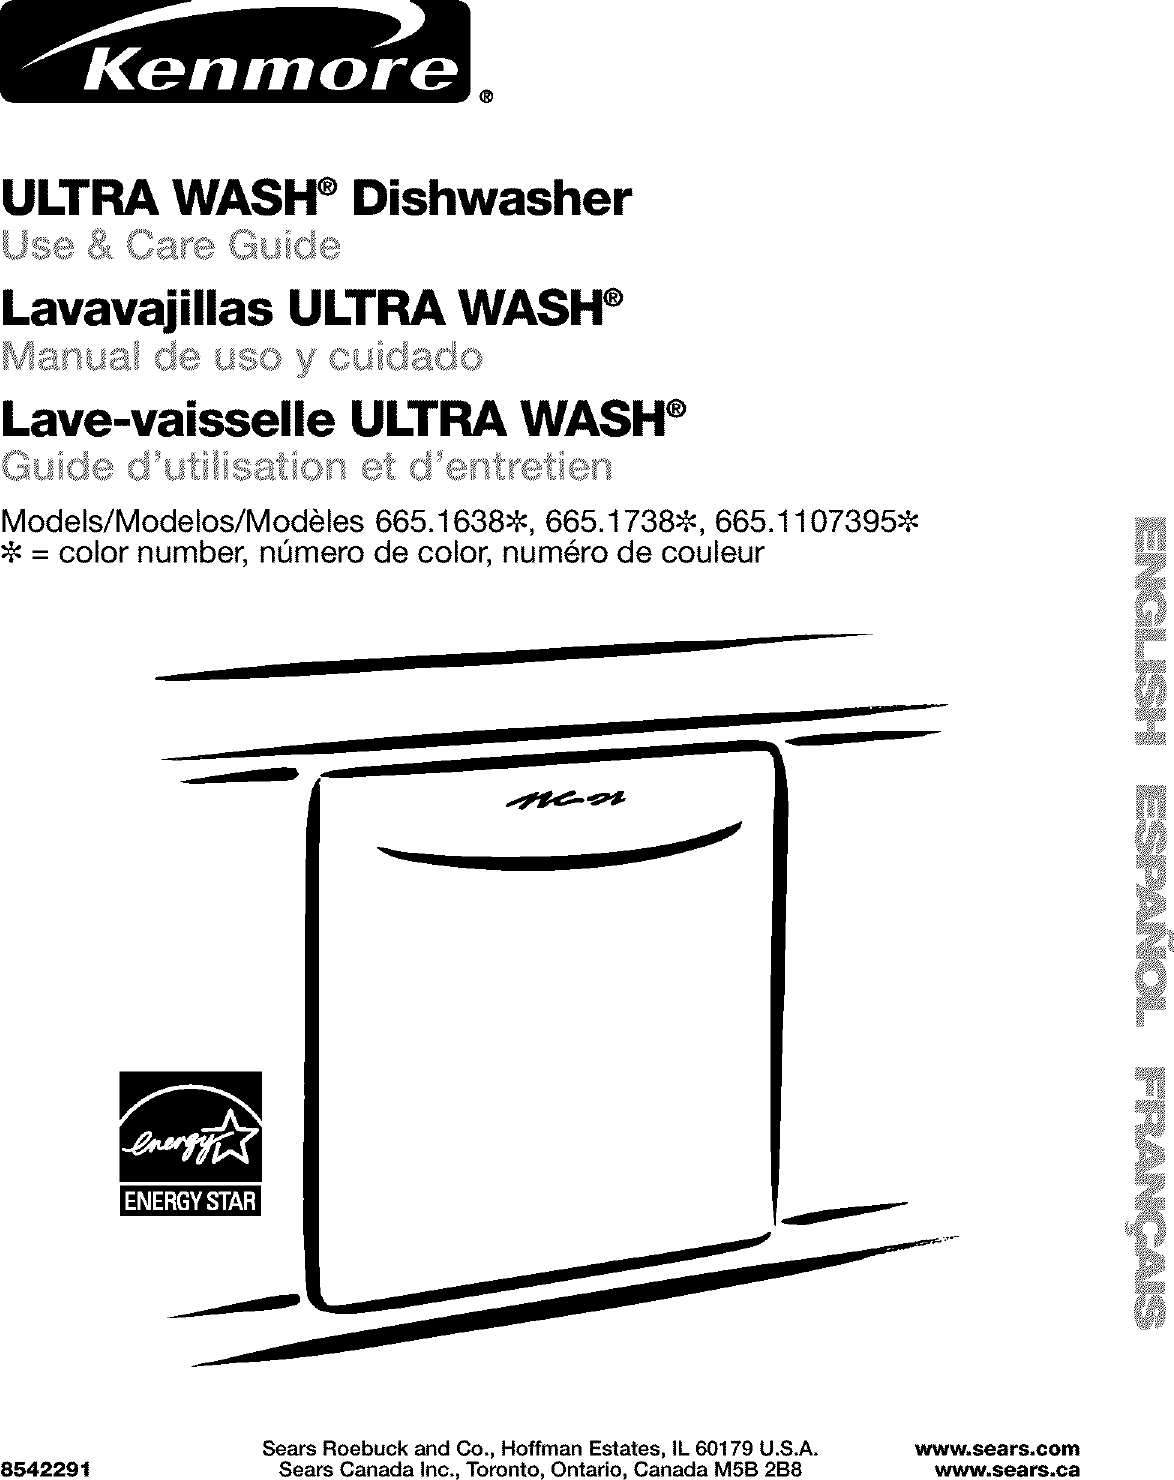 Kenmore User Manual Undercounter Dishwasher